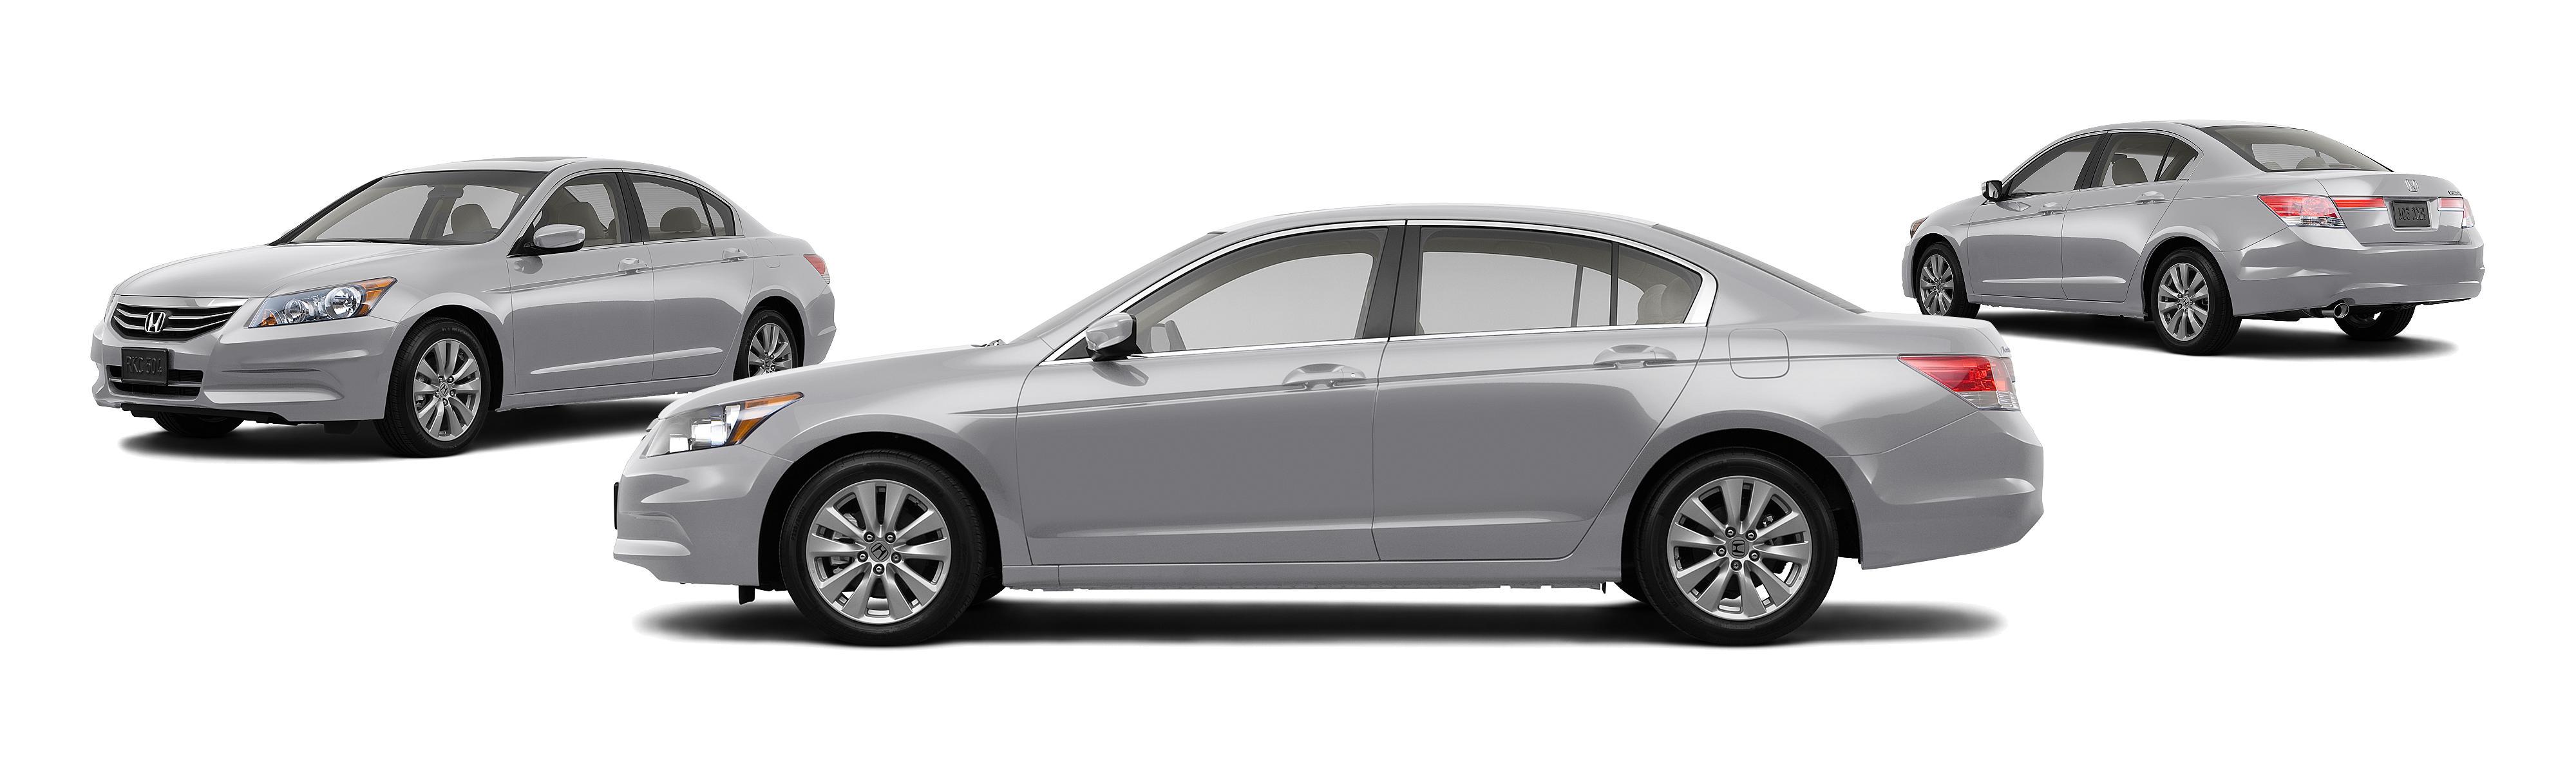 2011 Honda Accord Ex 4dr Sedan 5a Research Groovecar 2004 Crv Lx L4 24 Liter Gas Exhaust Components